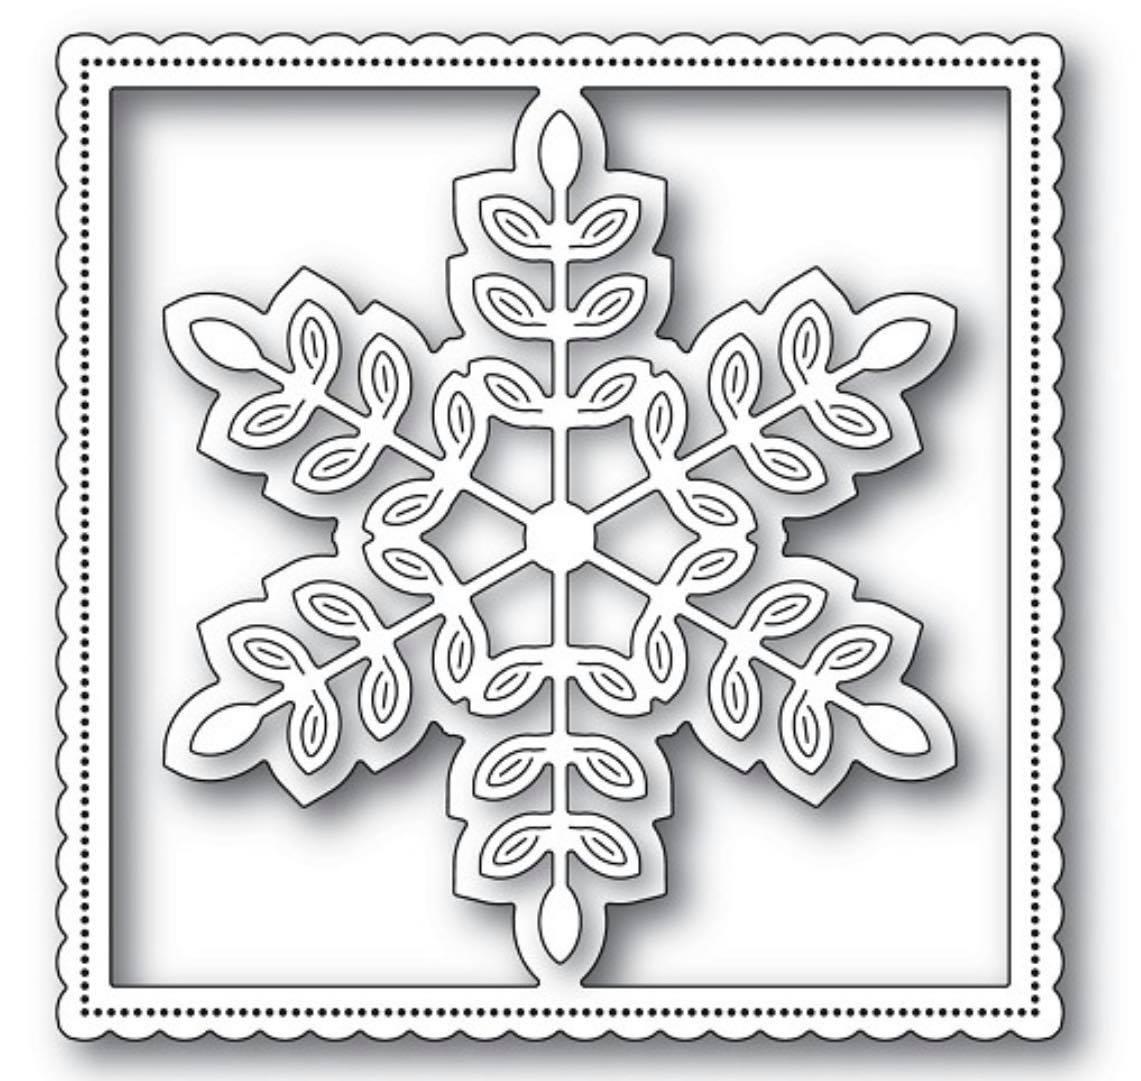 Poppy Stamps - Leafy Snowflake Frame Die